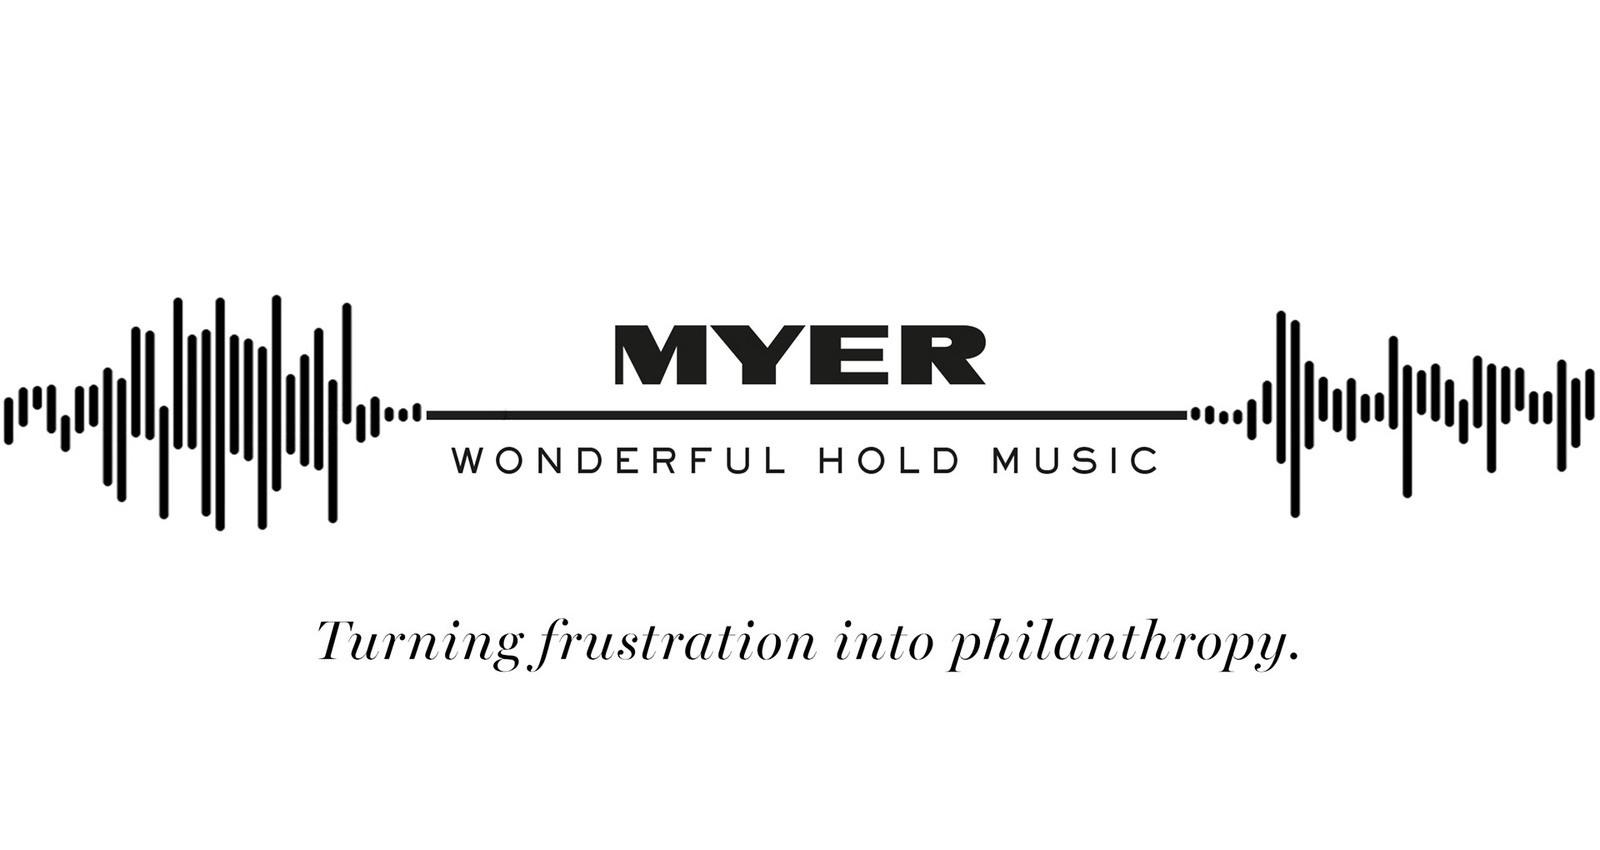 Wonderful Hold Music